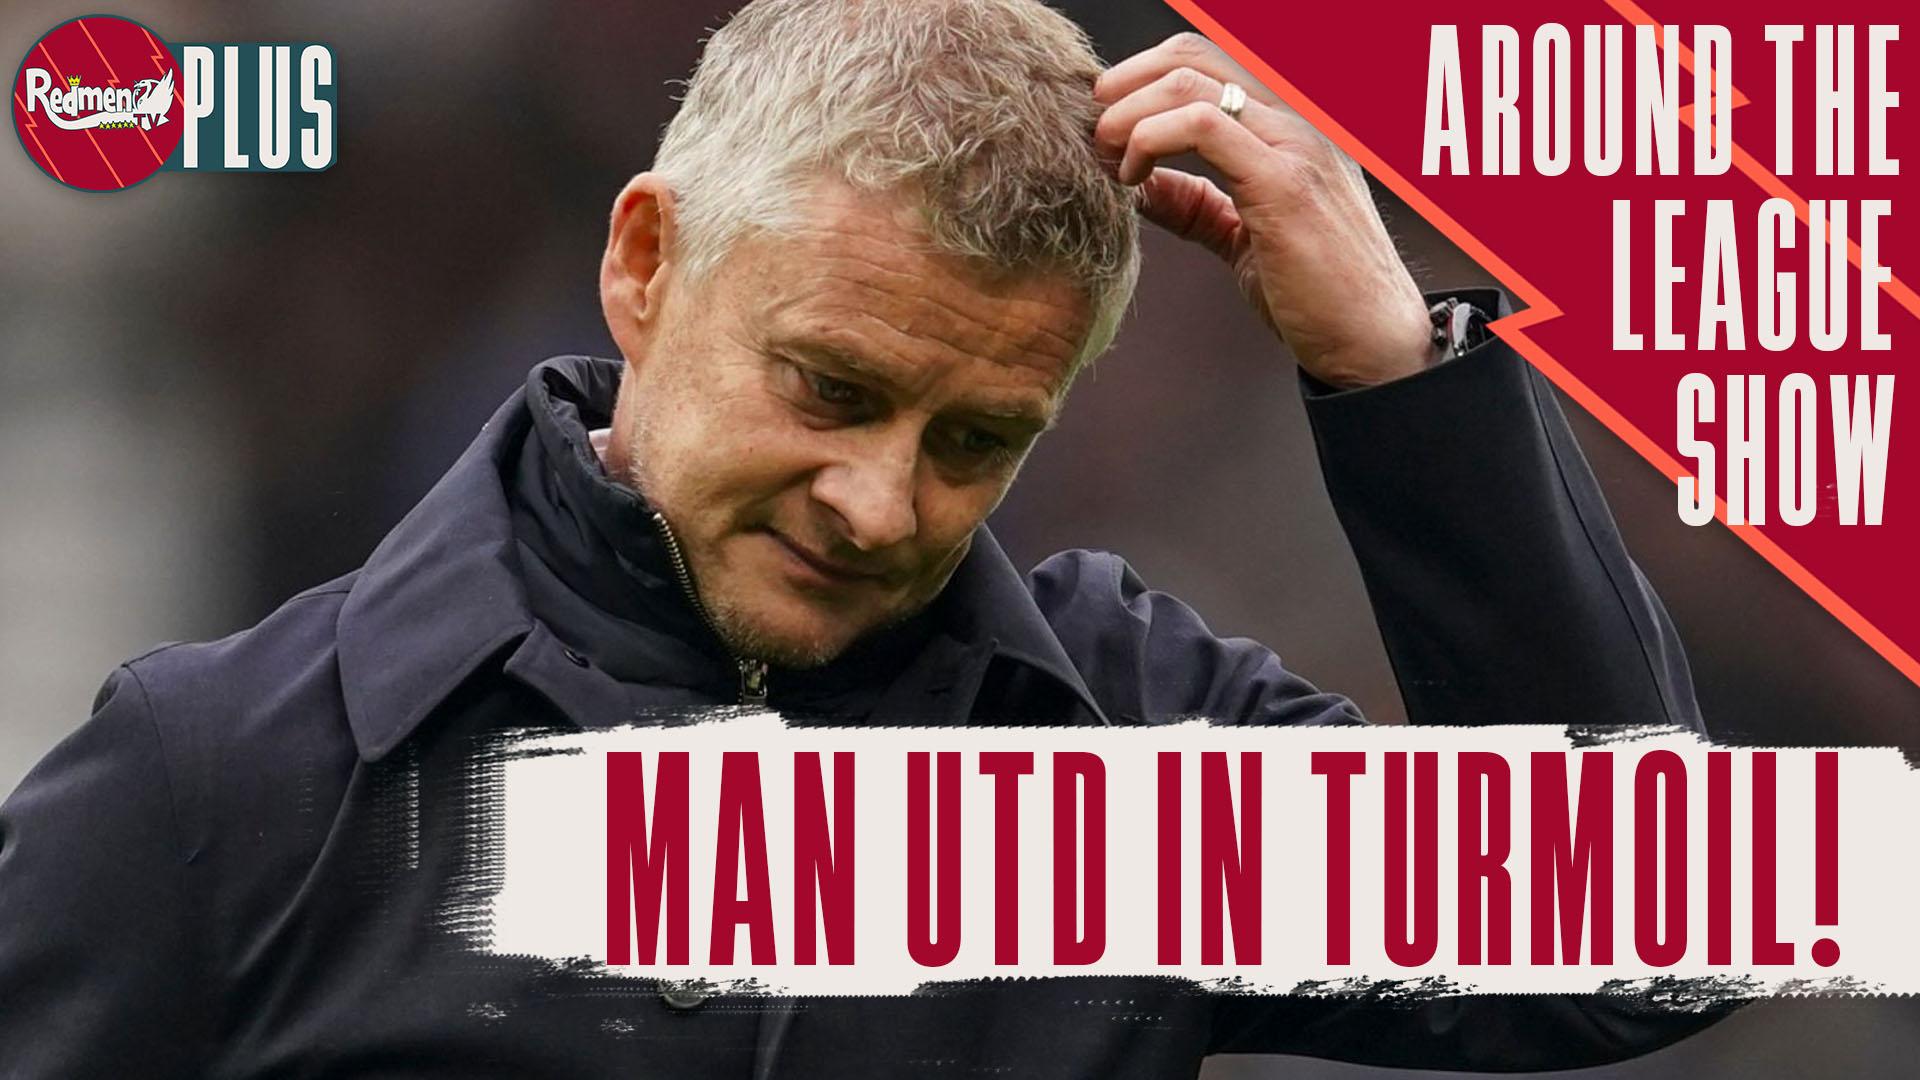 Man Utd in Turmoil! | Around the League Show – The Redmen TV